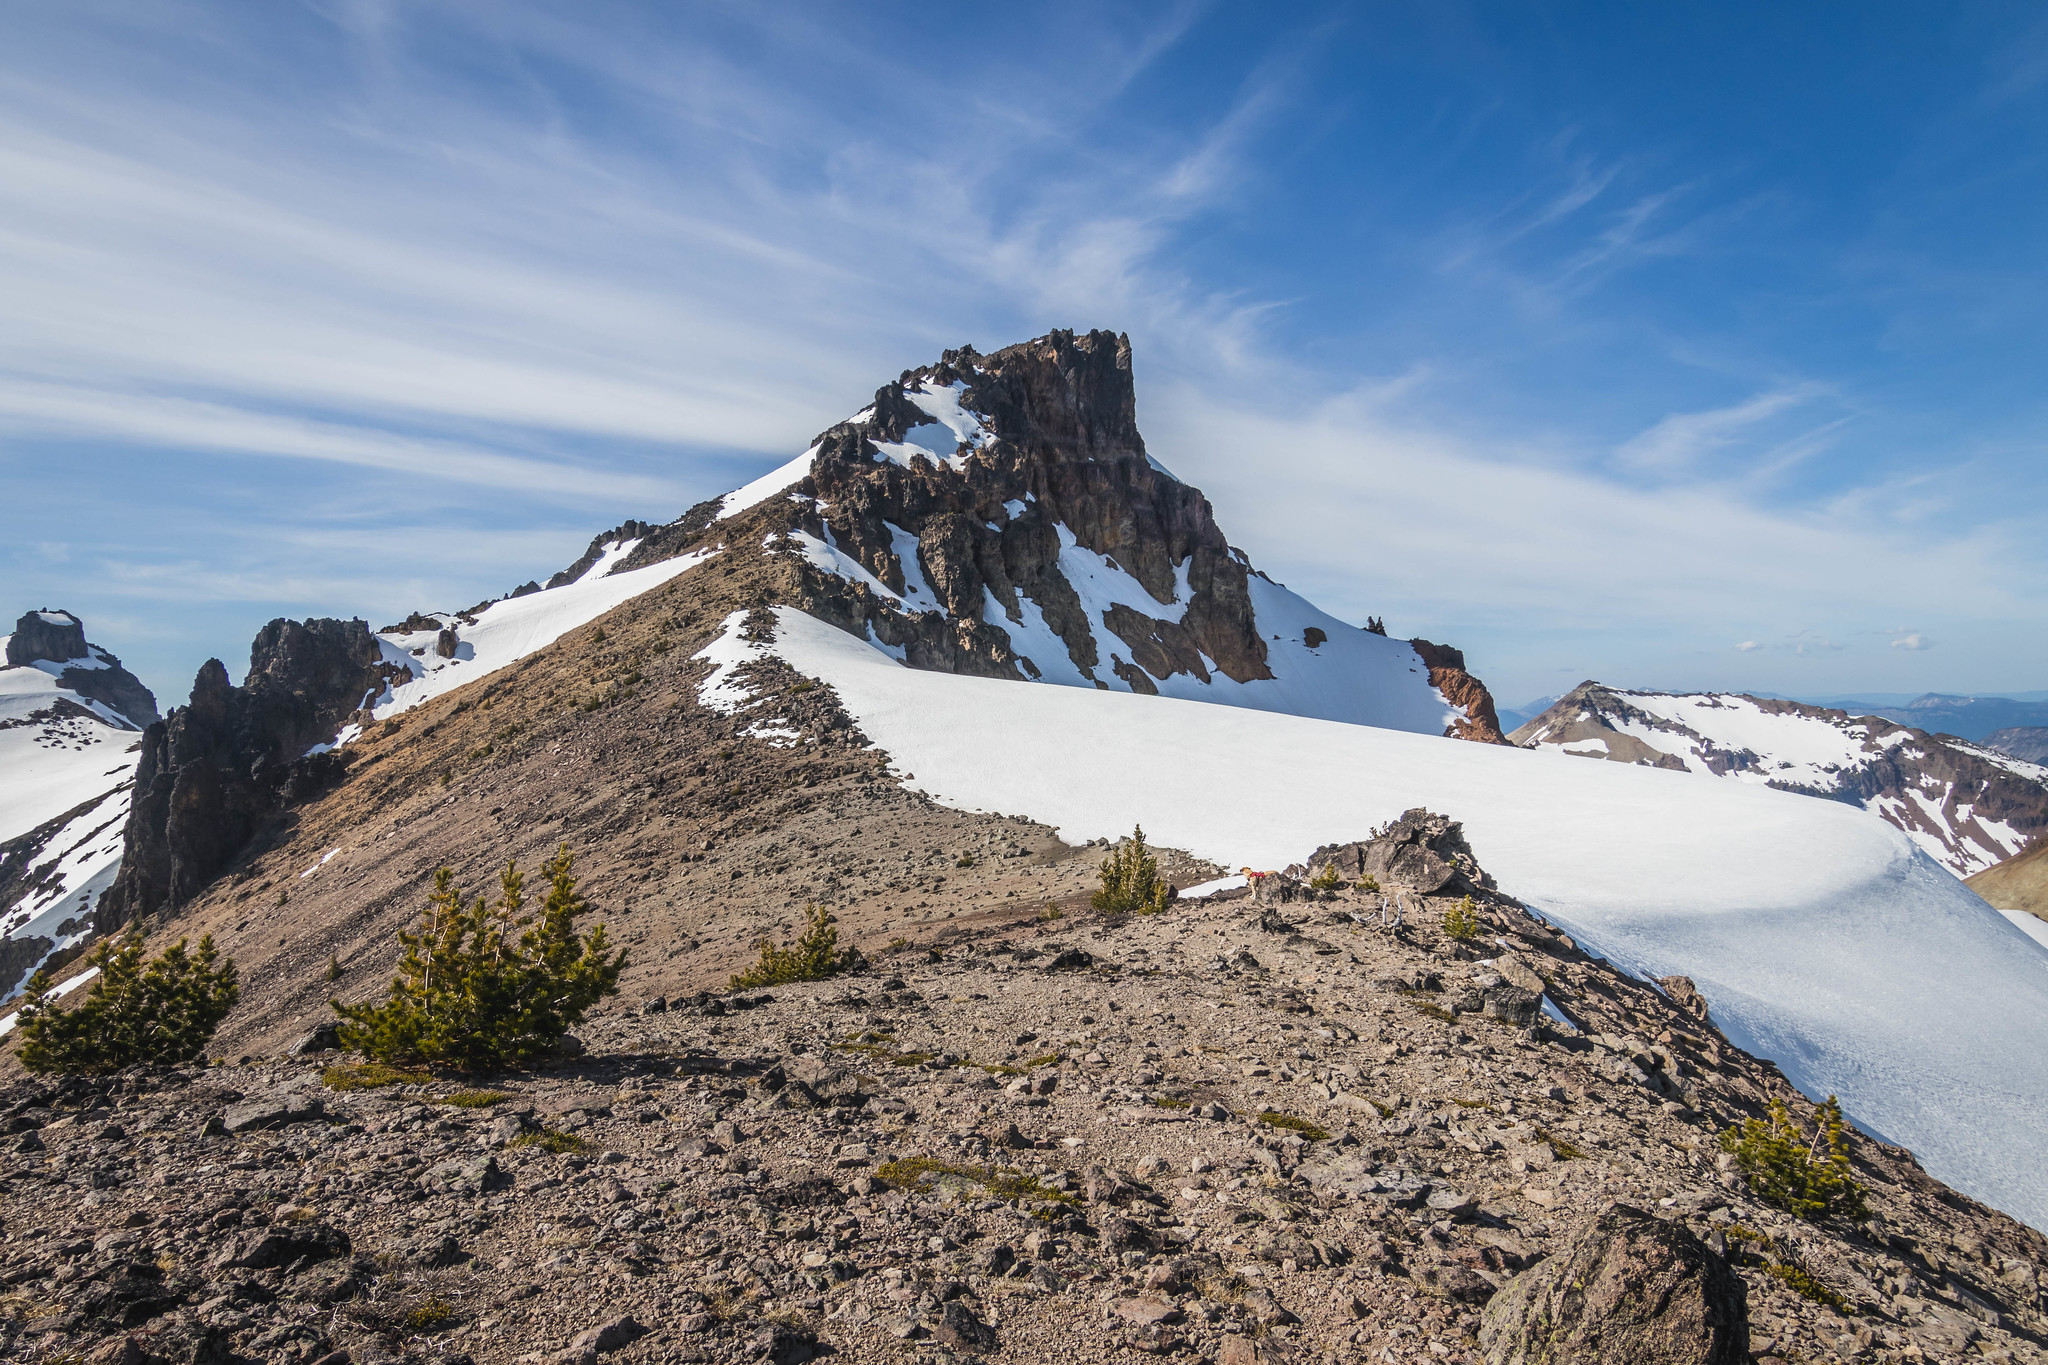 Gilbert Peak patiently awaits